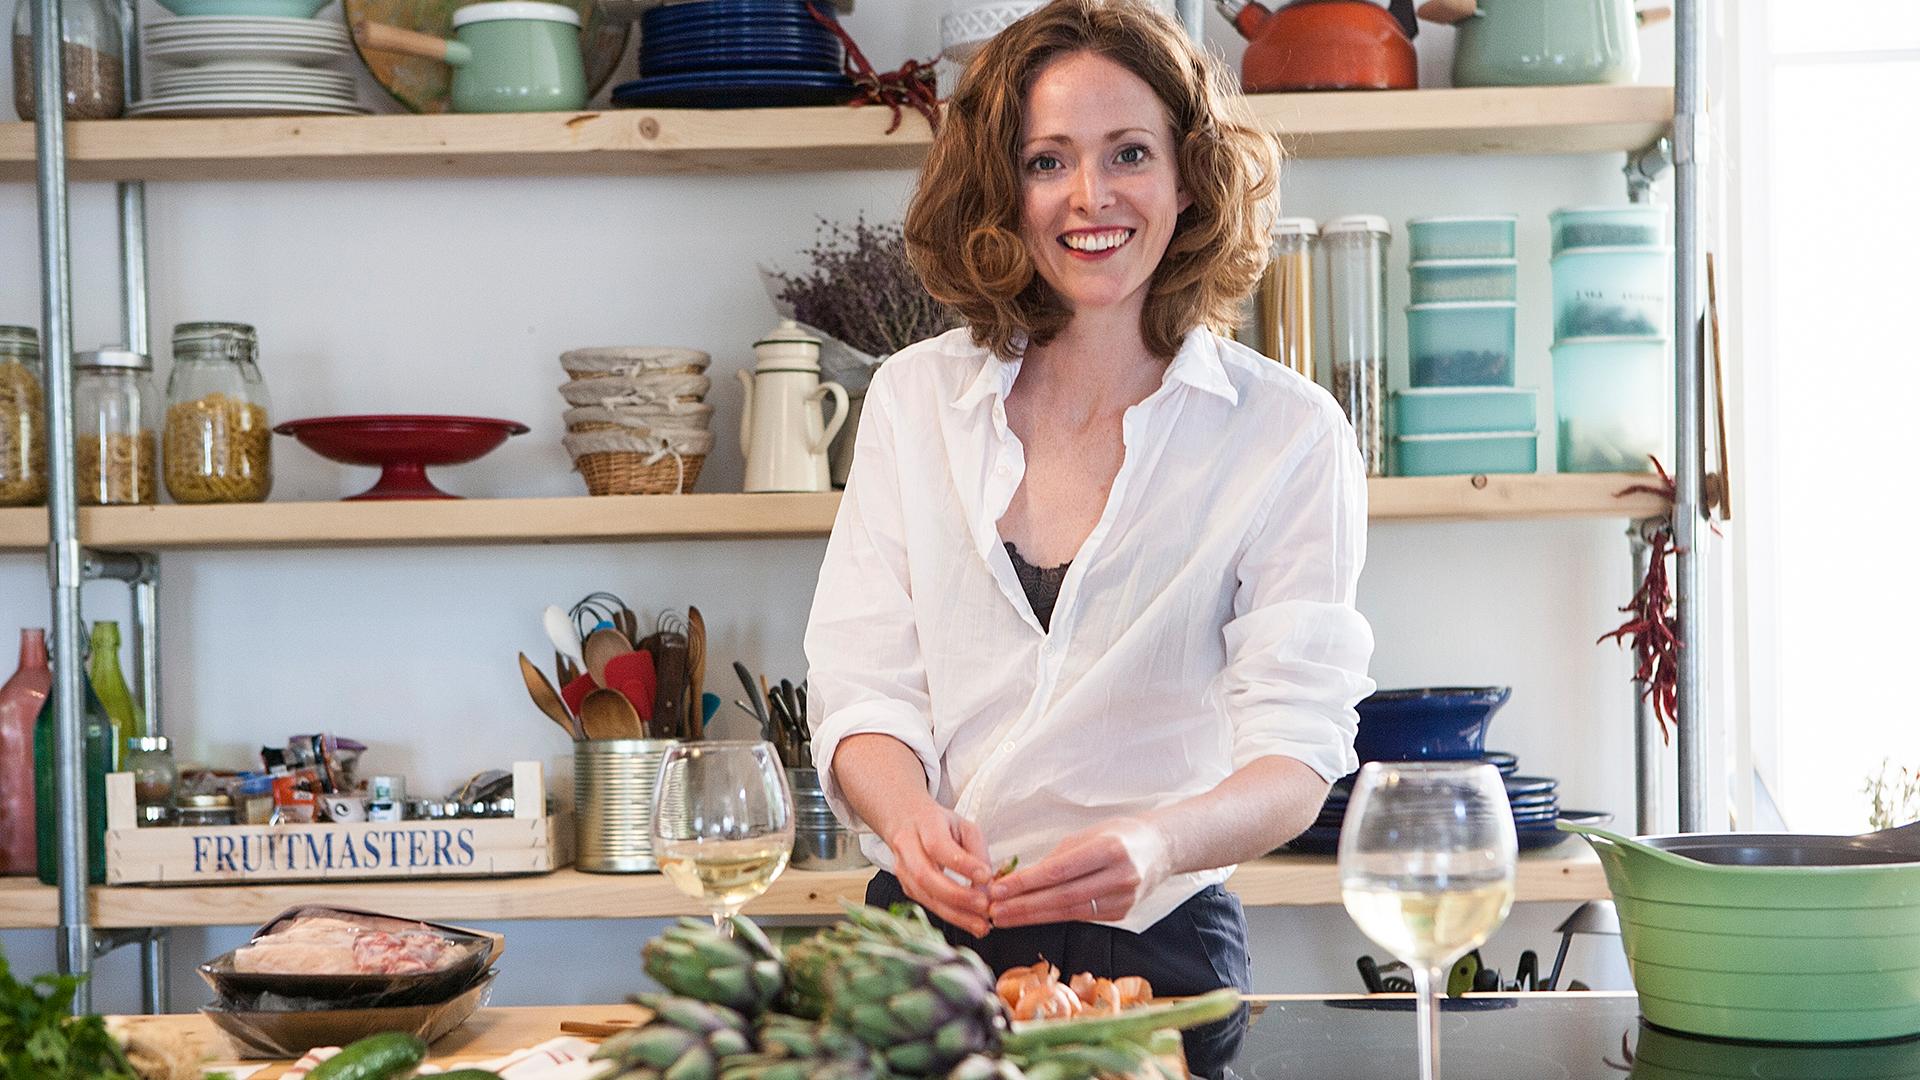 Alanna-Lawley-preparing-brunch-in-Greece-Foodadit